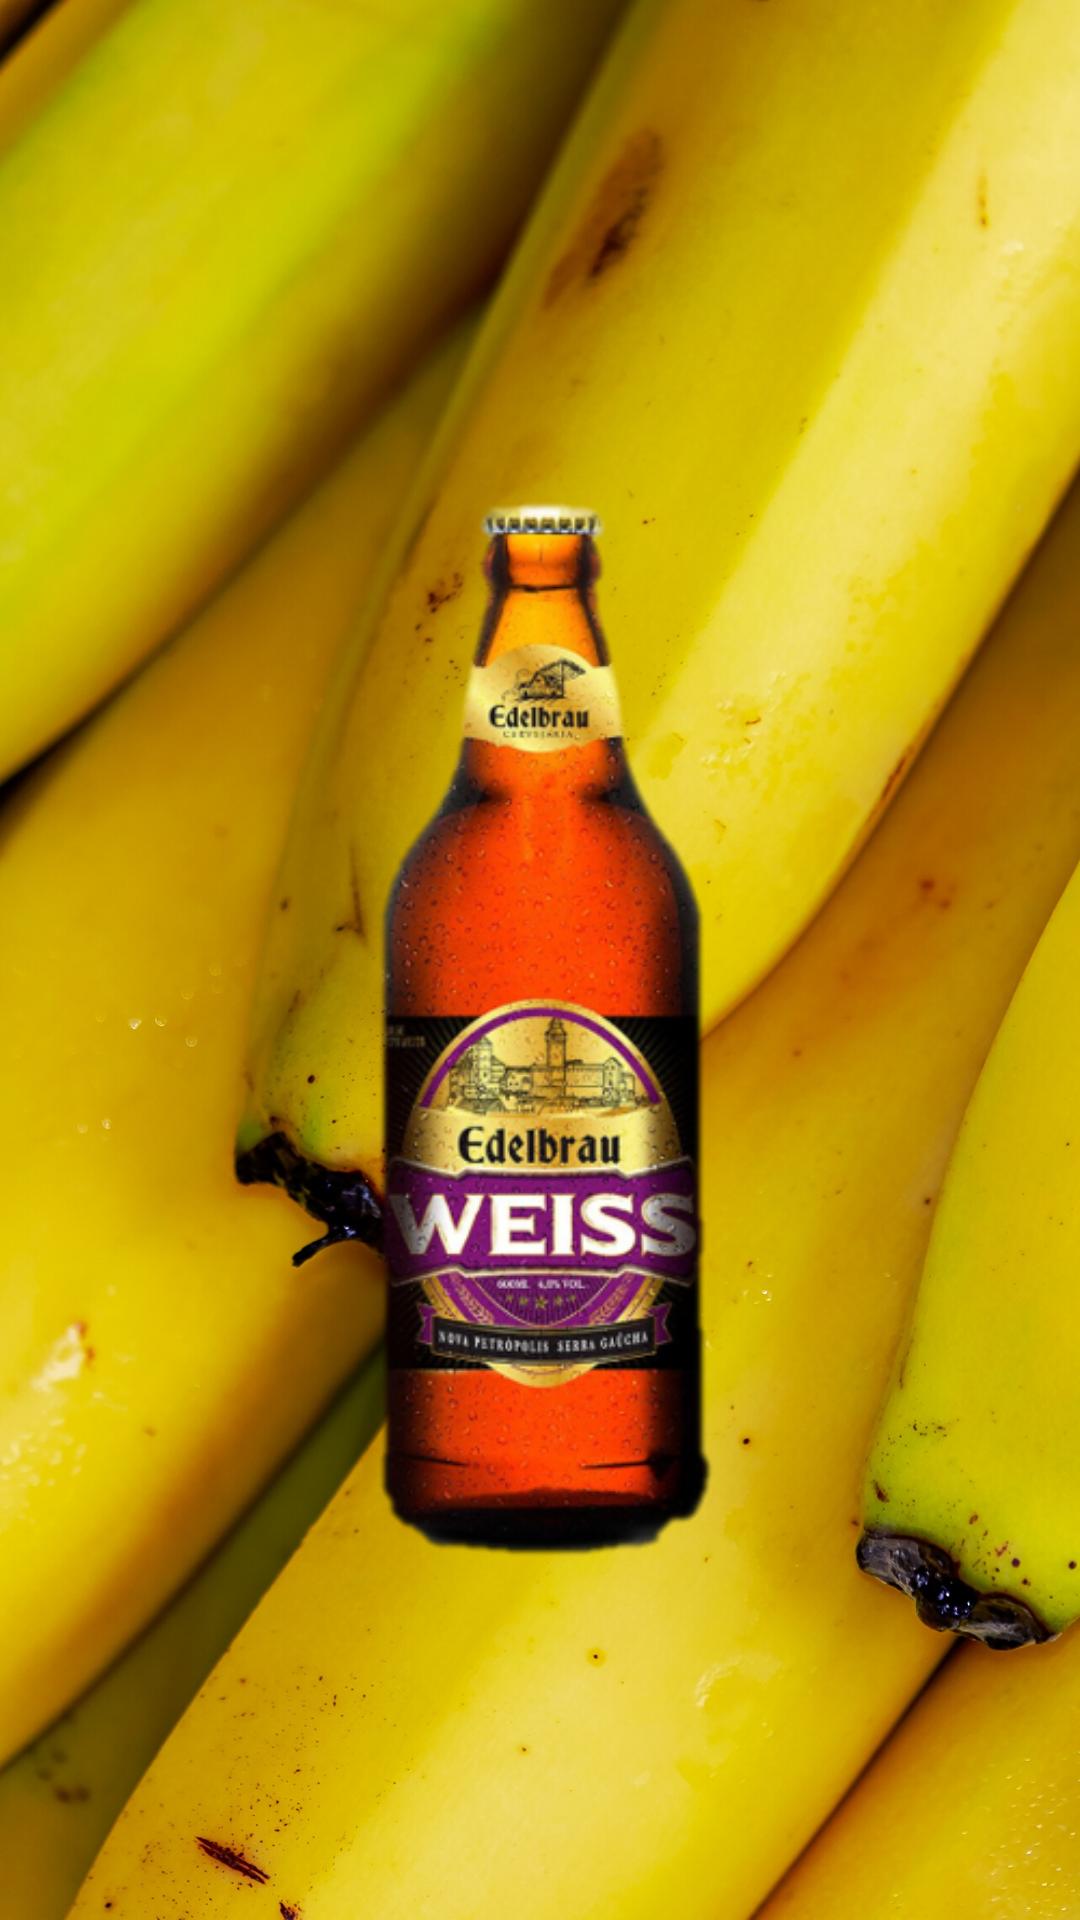 Edelbrau Weiss